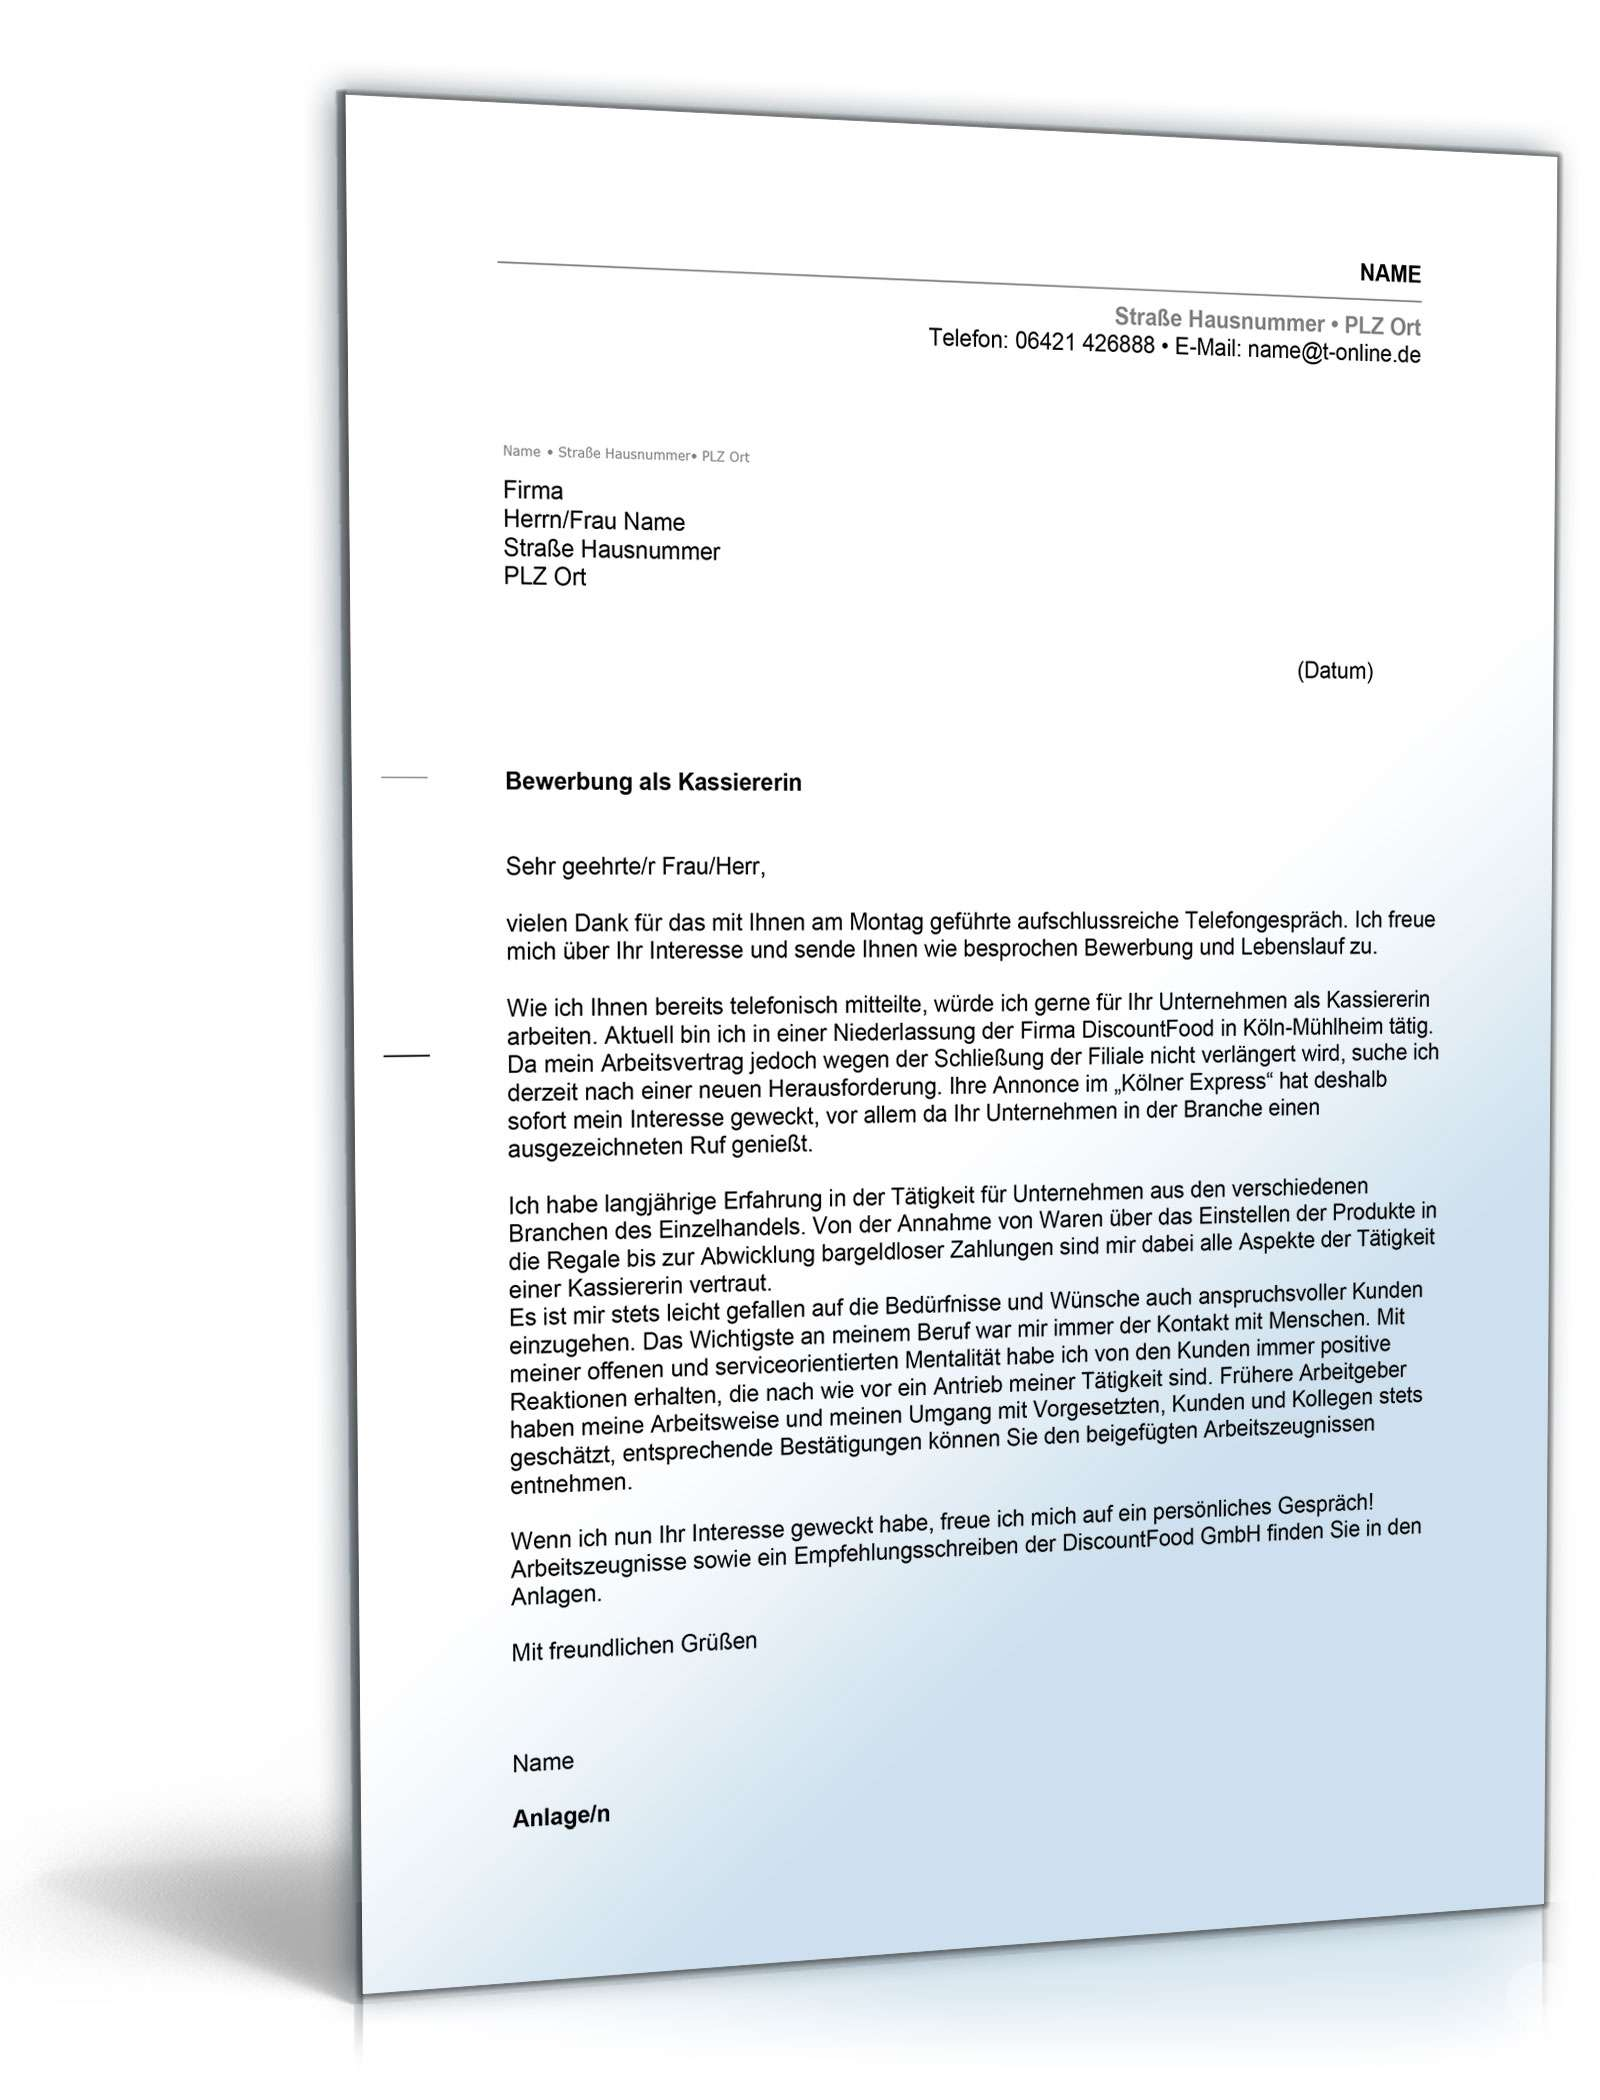 Anschreiben Bewerbung Kassiererin Muster Zum Download